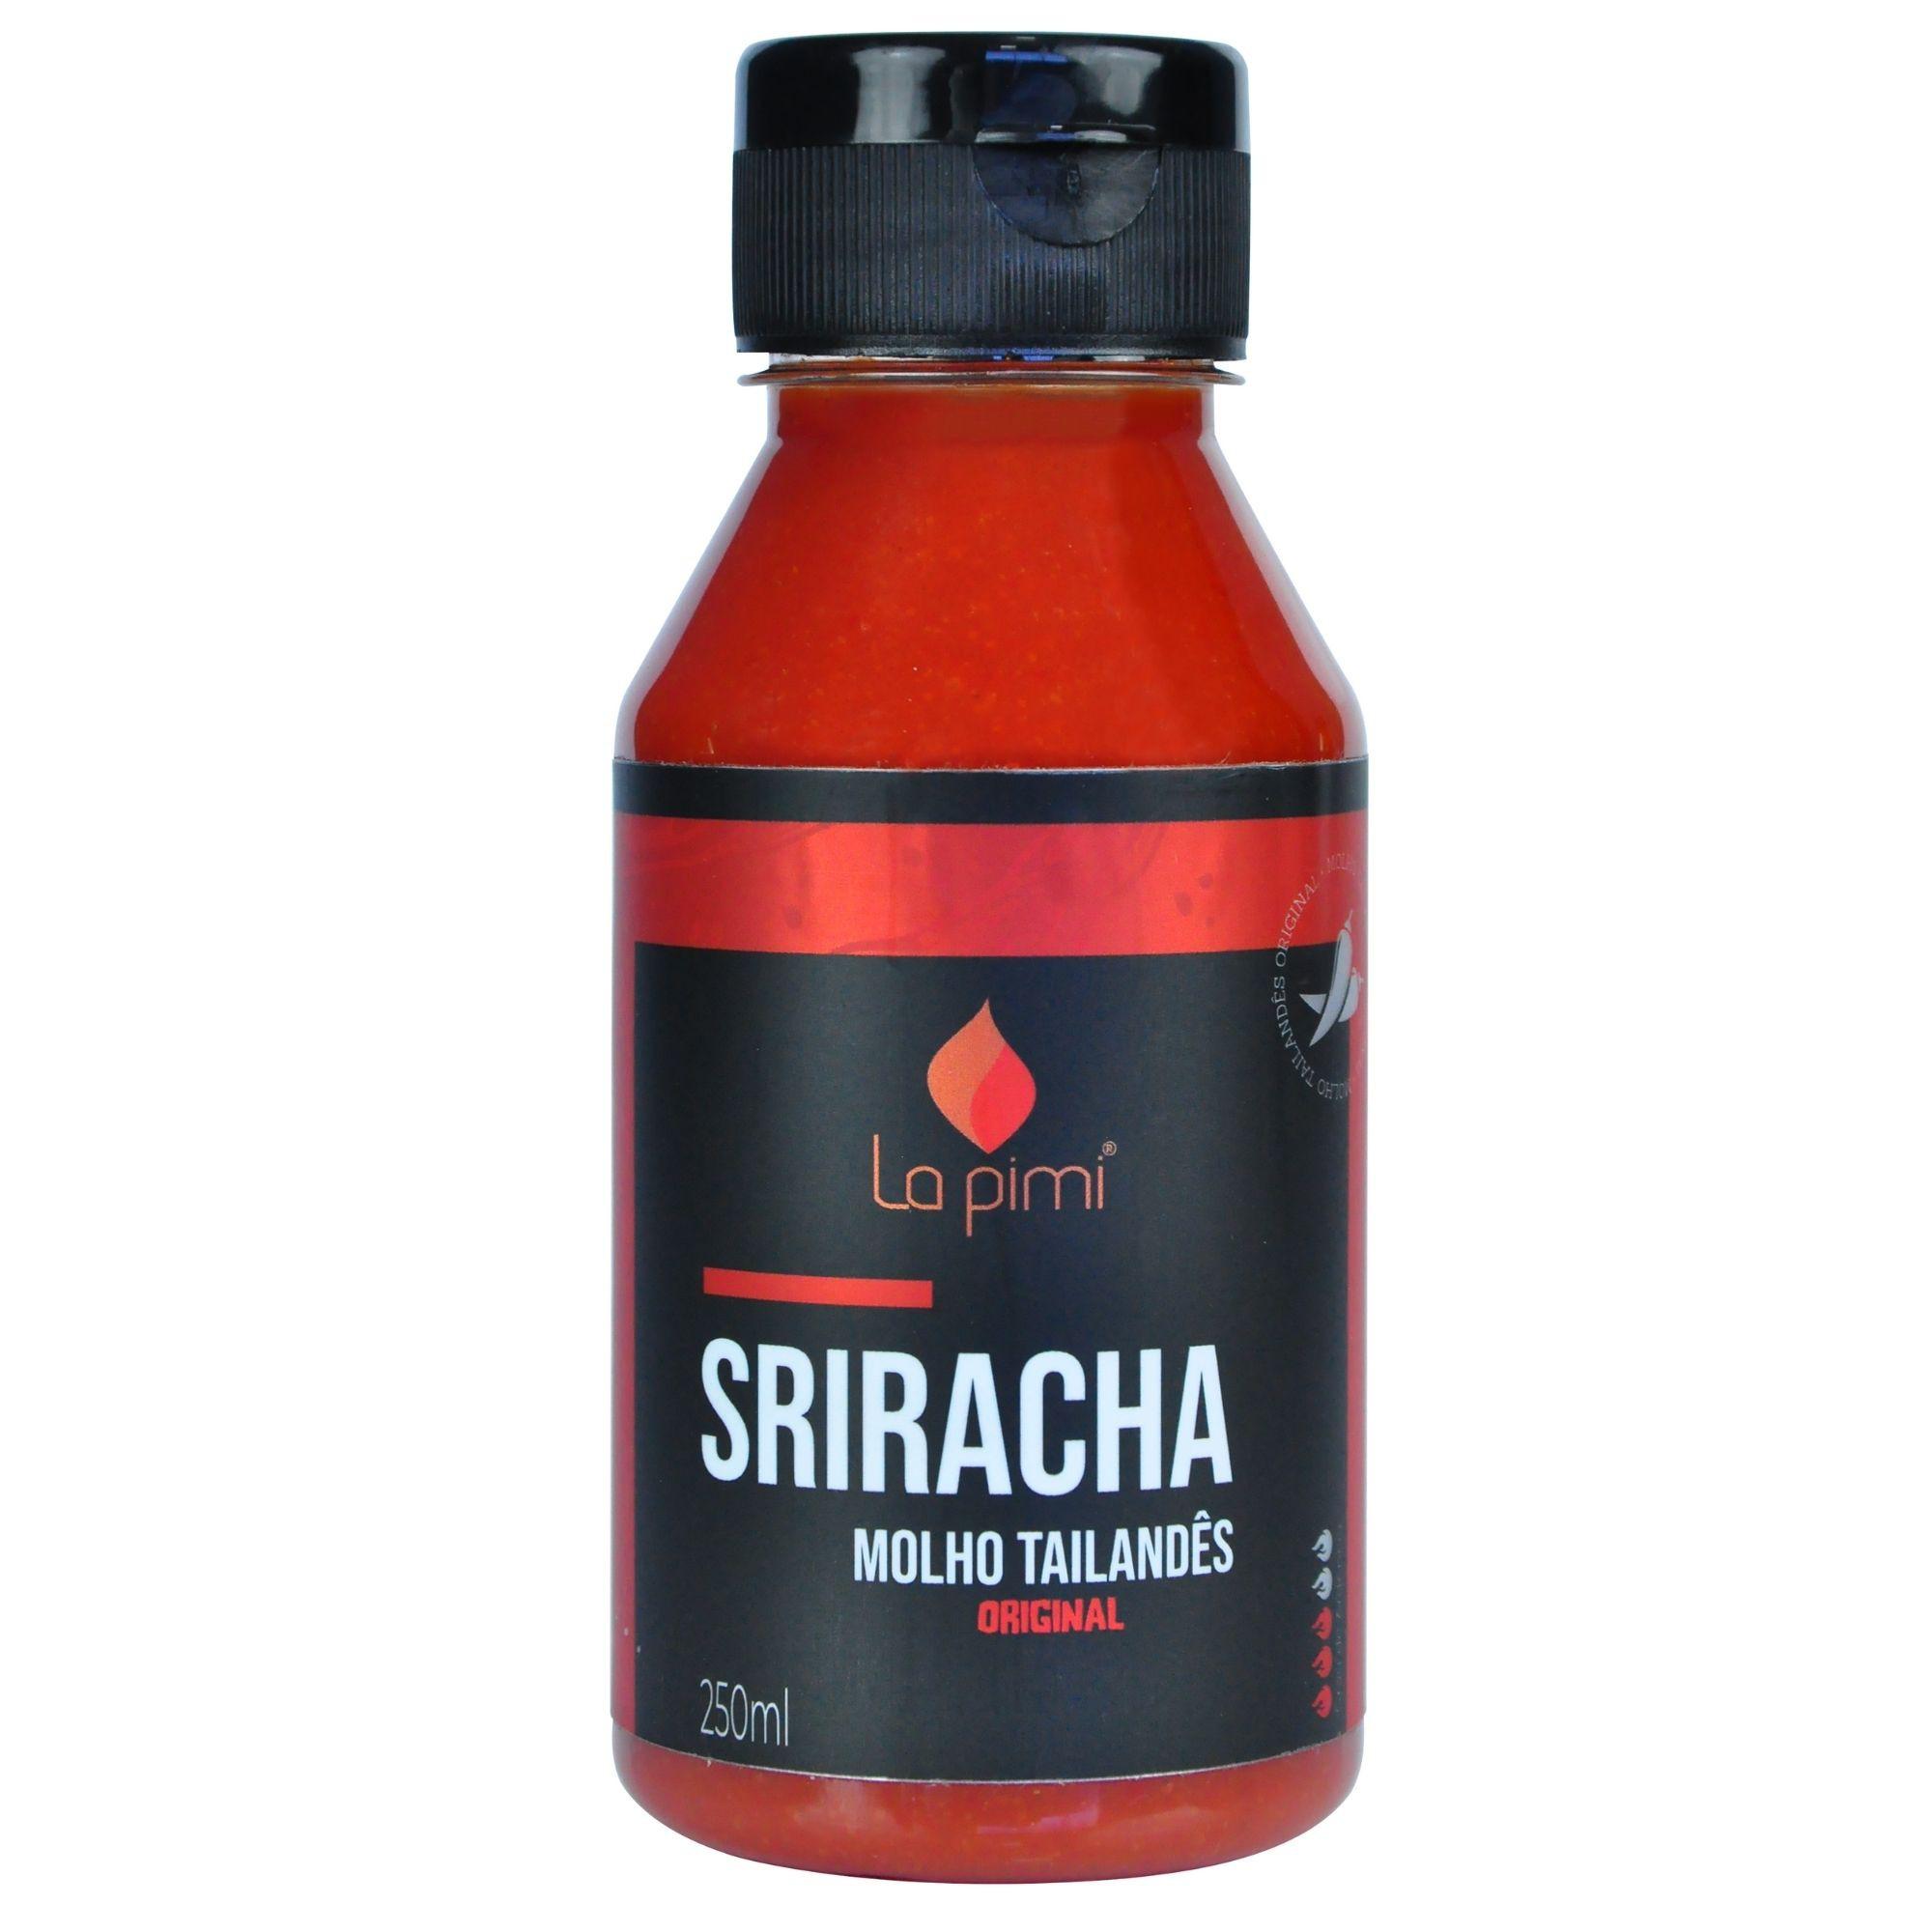 Molho Sriracha Tailandês Original La pimi